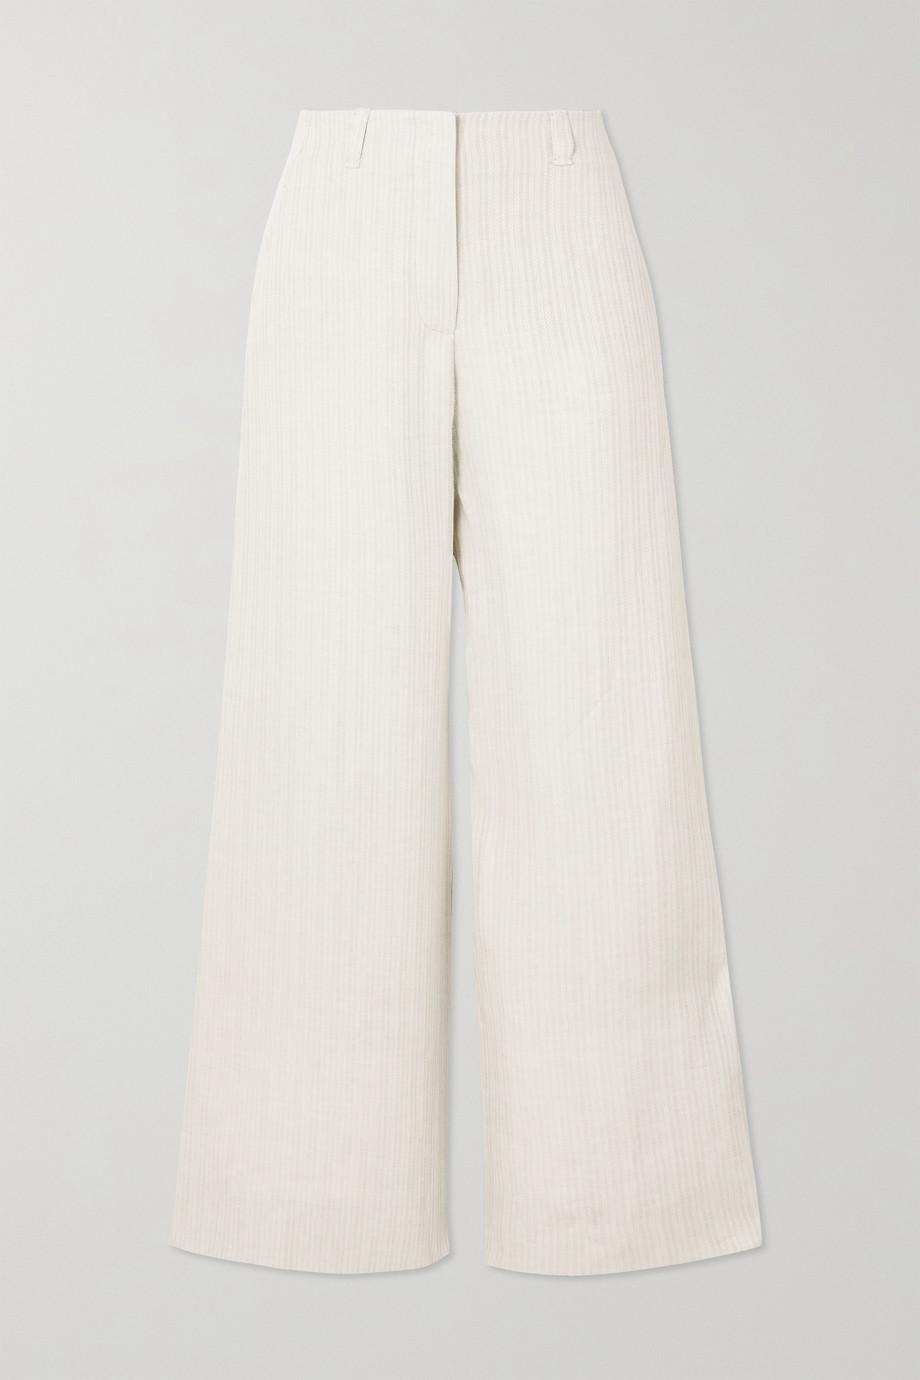 Loro Piana Harve herringbone linen wide-leg pants